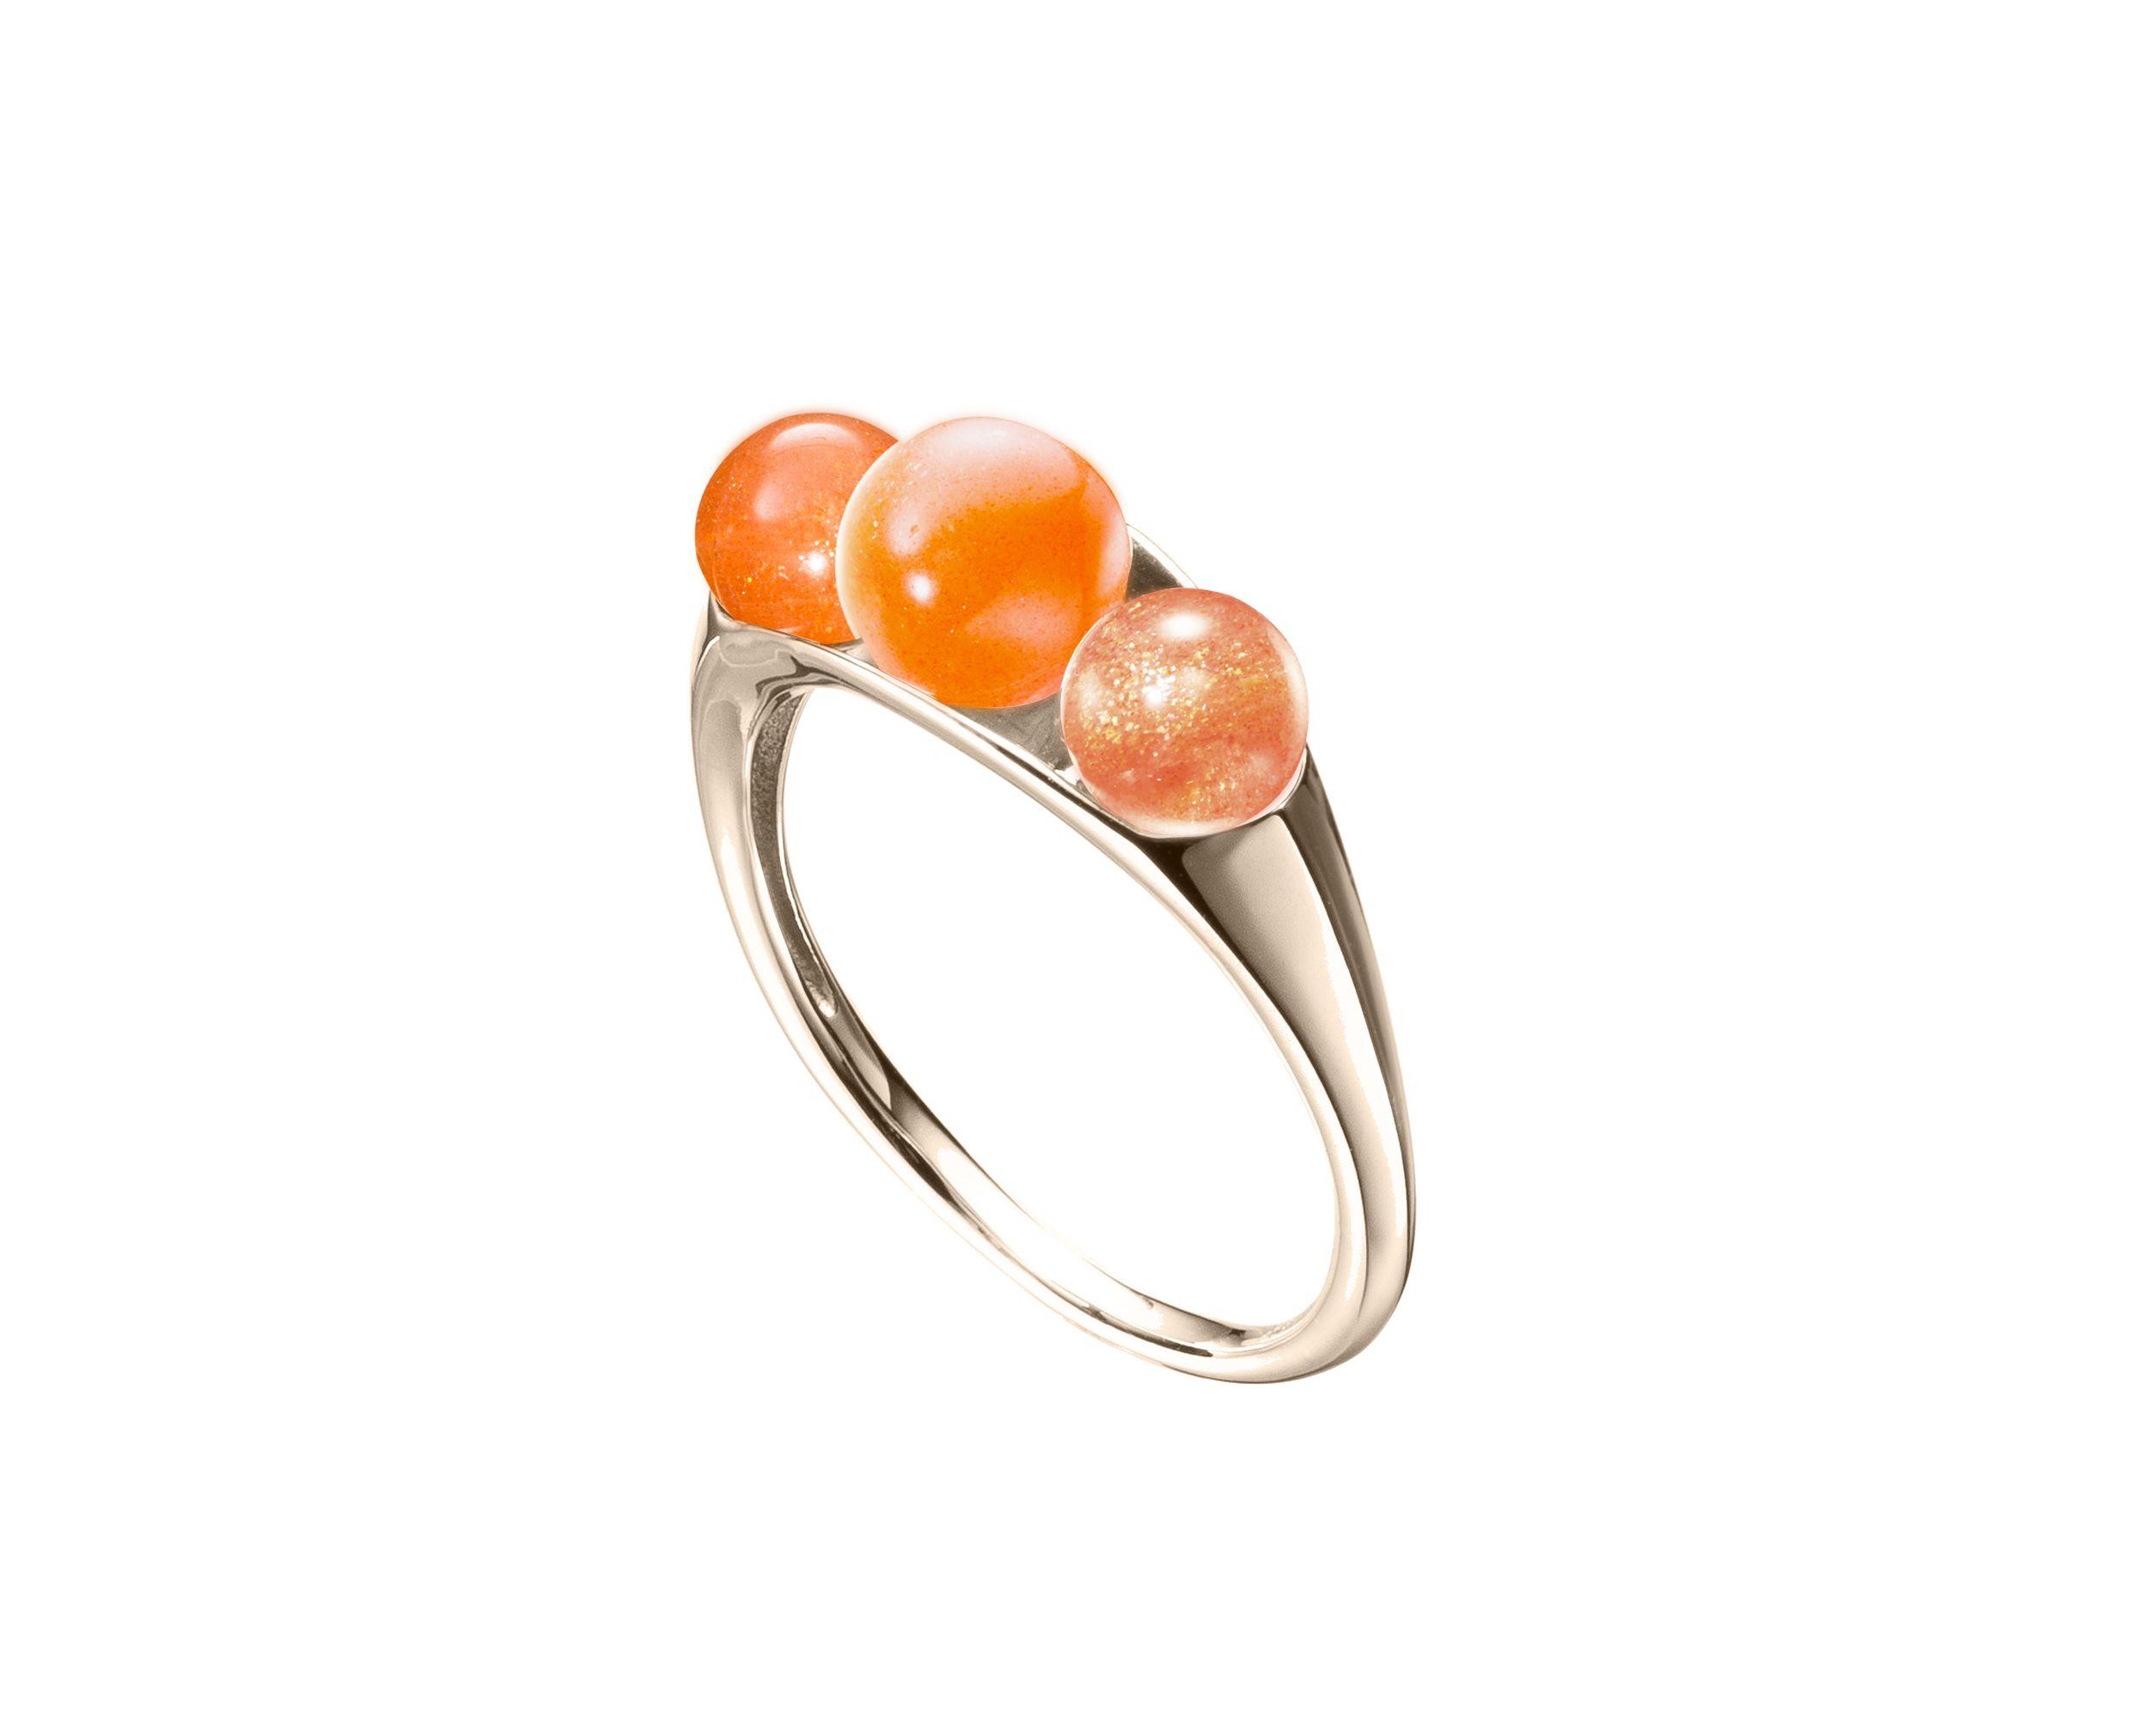 Oregon sunstone ring in 14k gold, Orange gemstone